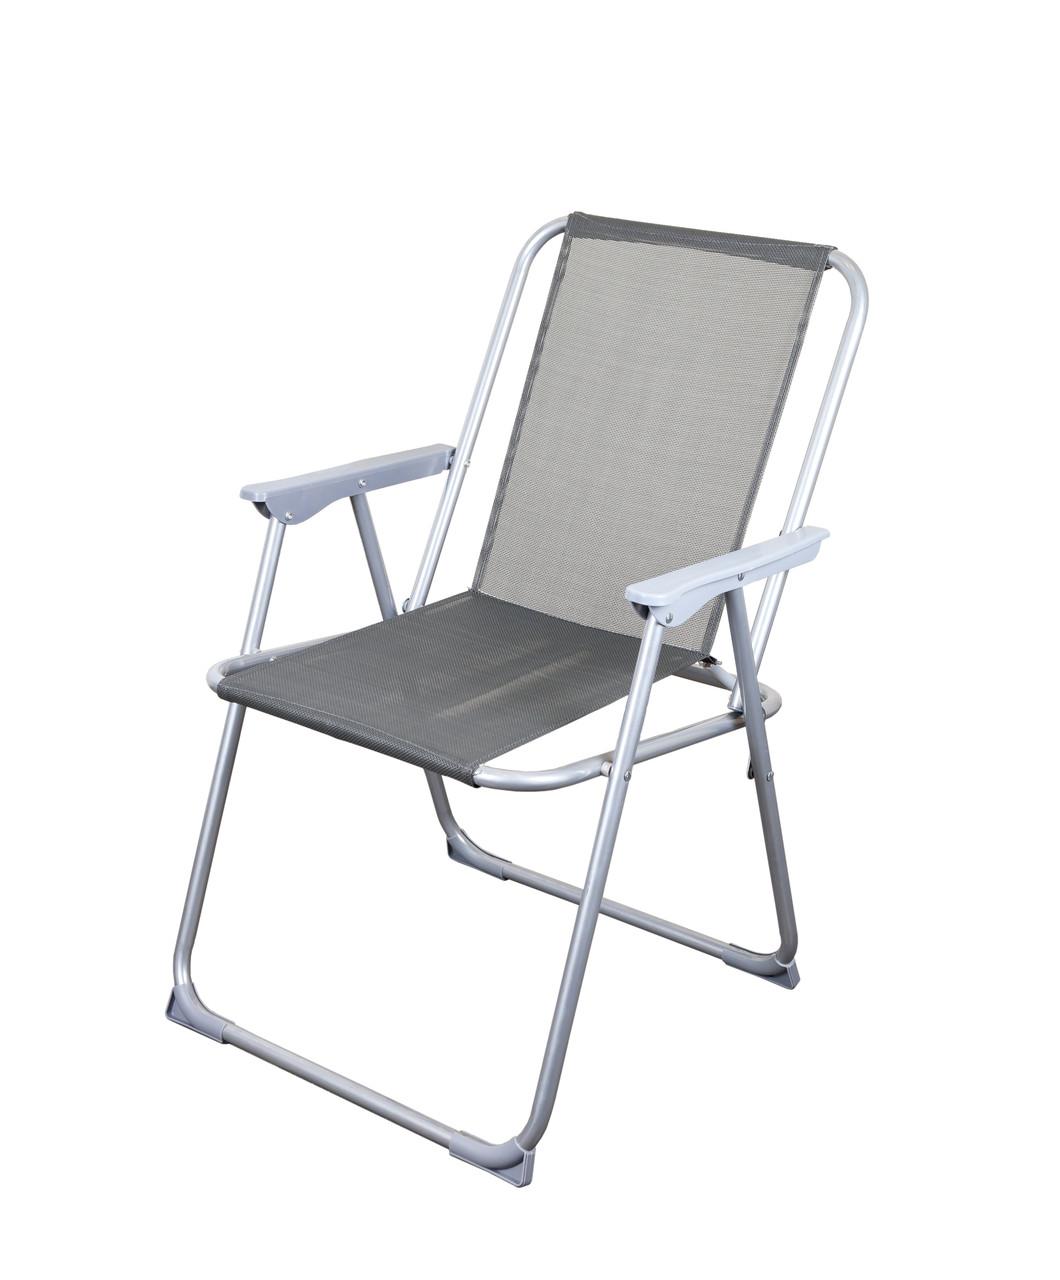 Серый складной стул